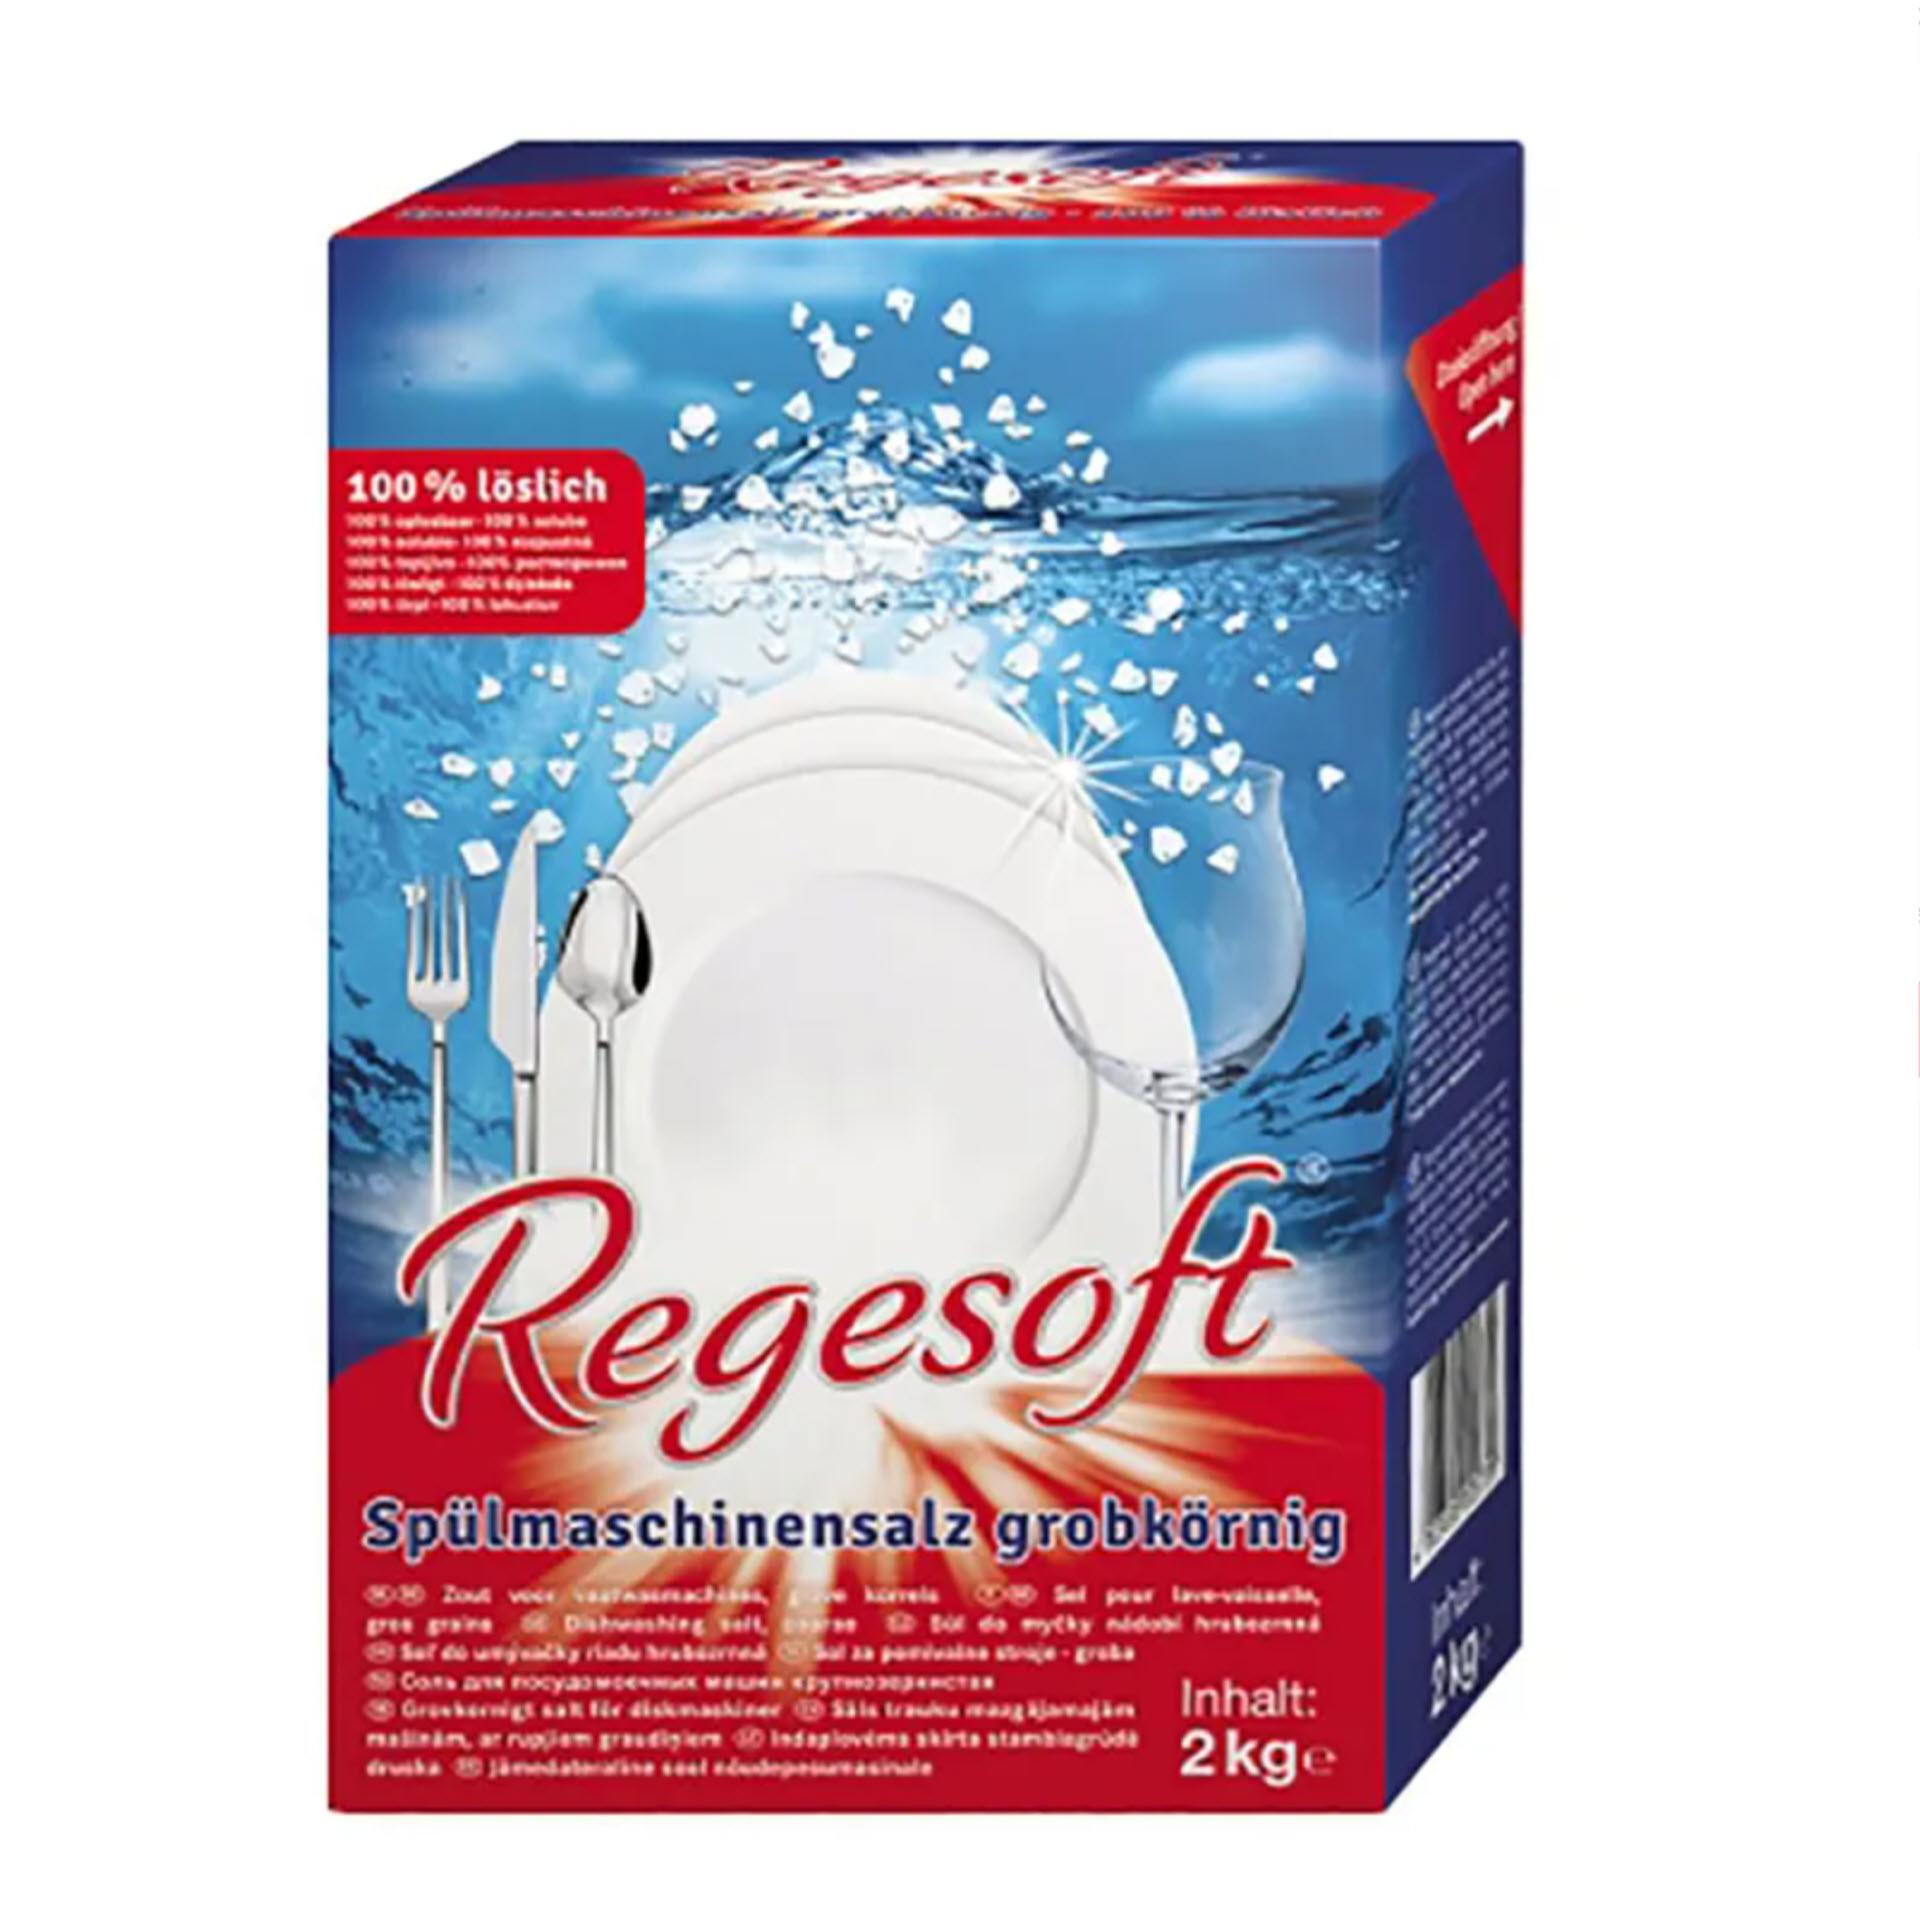 Esco Regesoft® Spülmaschinensalz grobkörnig 2 kg Faltkarton